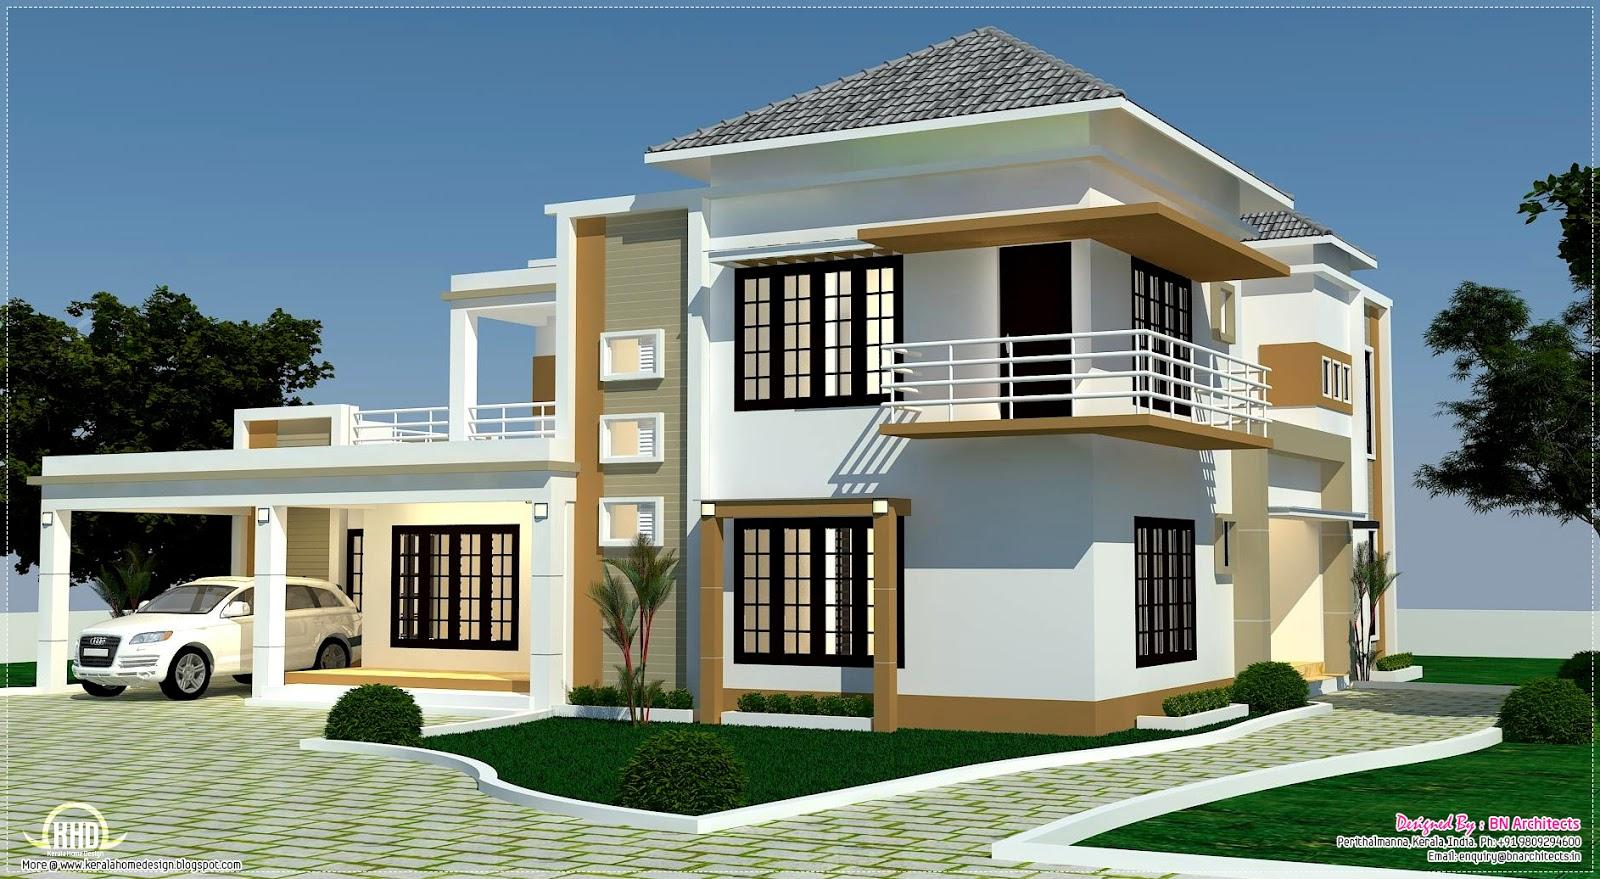 Floor Plan, 3D Views And Interiors Of 4 Bedroom Villa